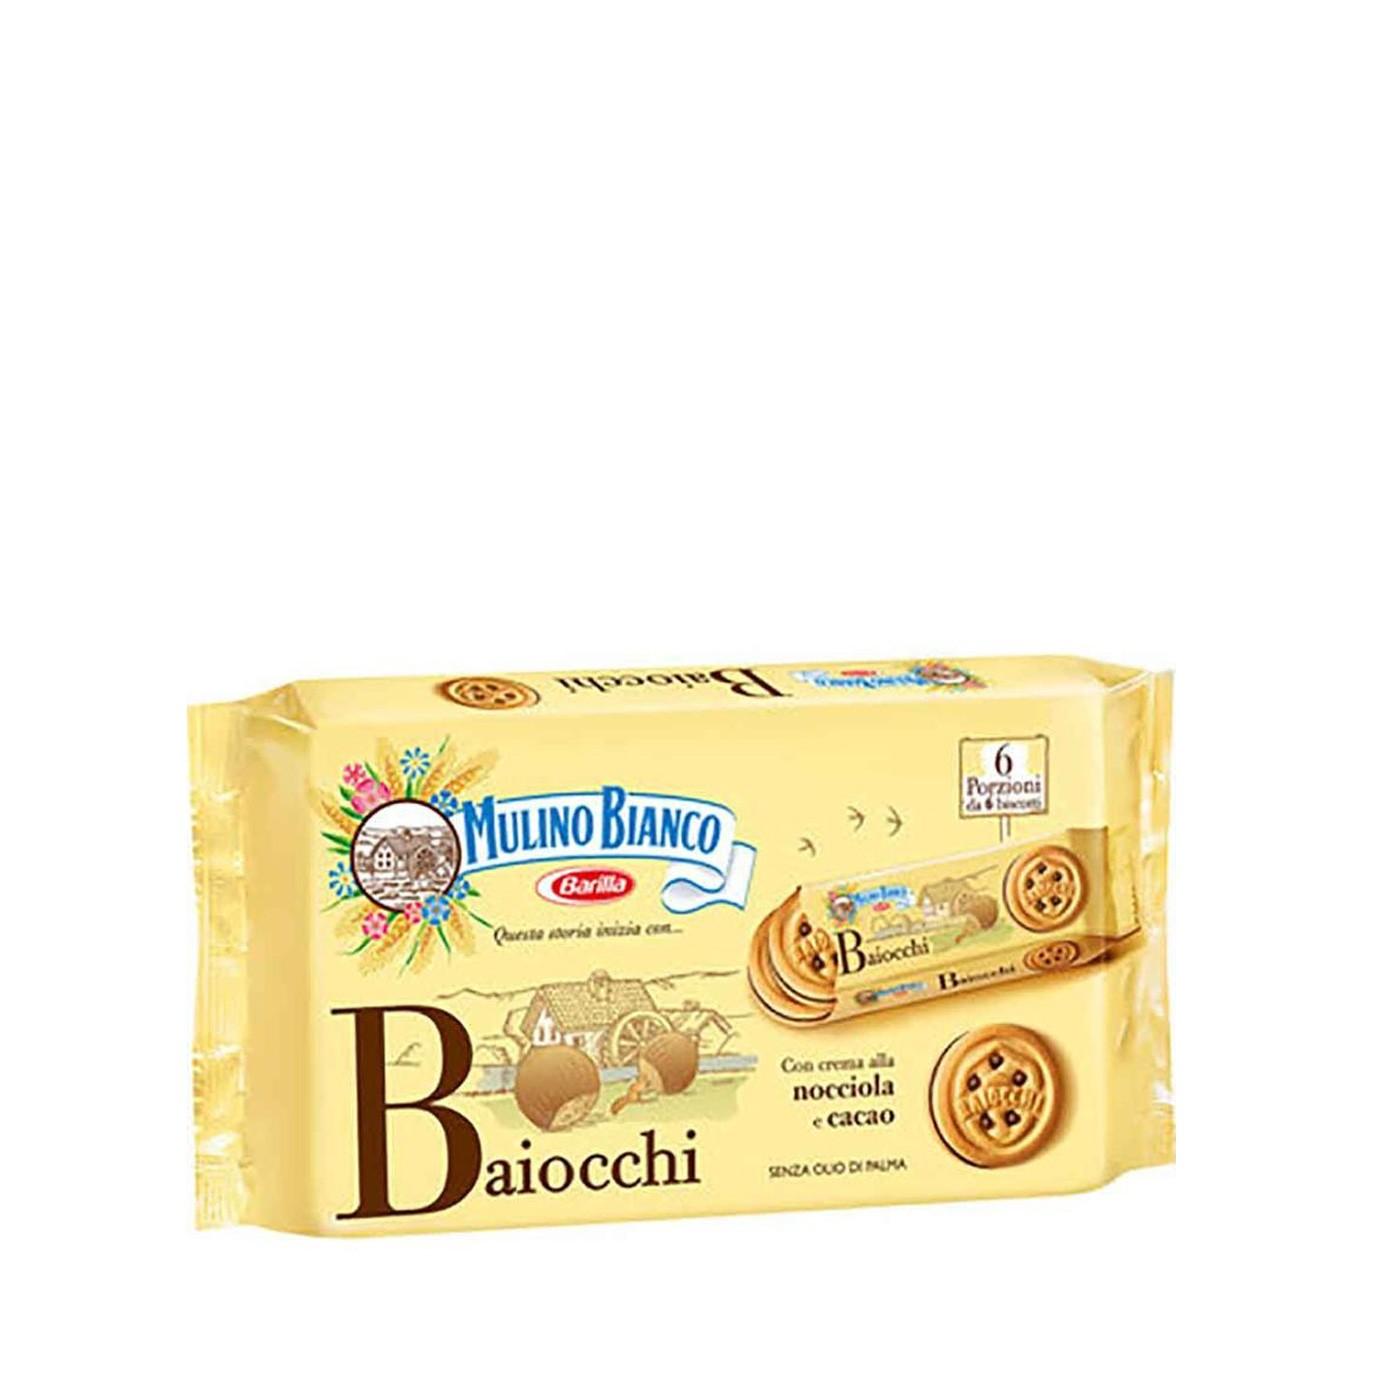 Baiocchi Cookie Box 12 oz